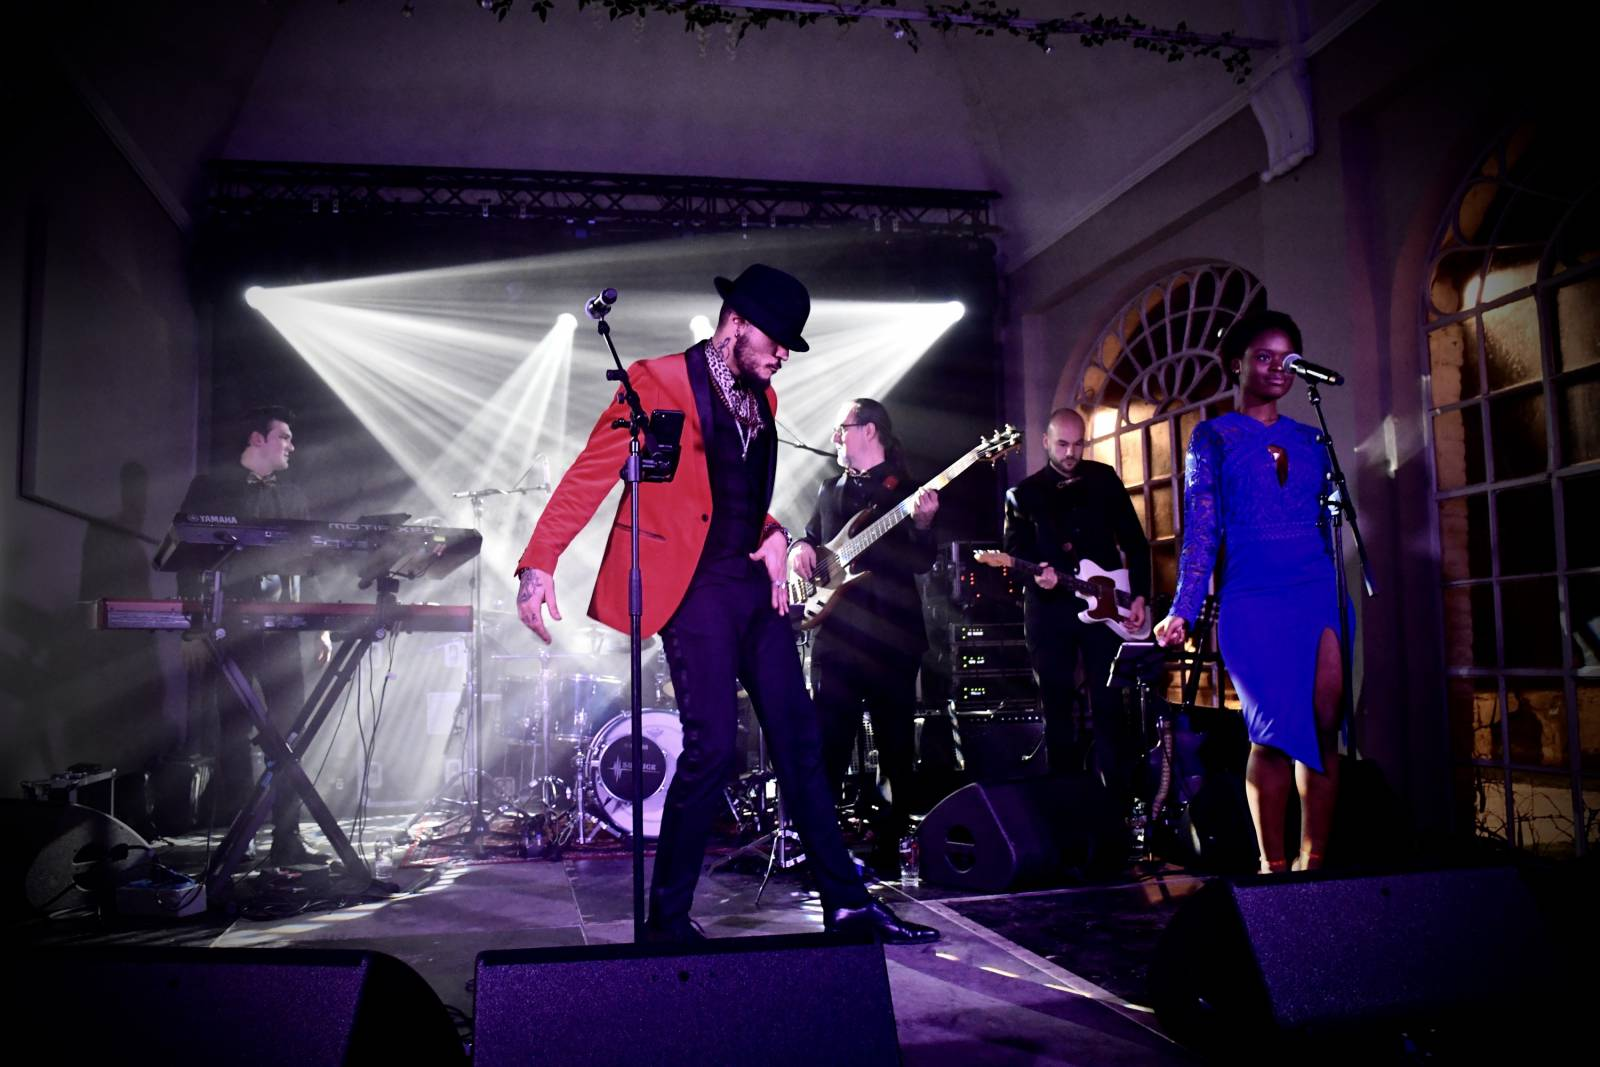 Yass Smaali zanger arties house of weddings(6)